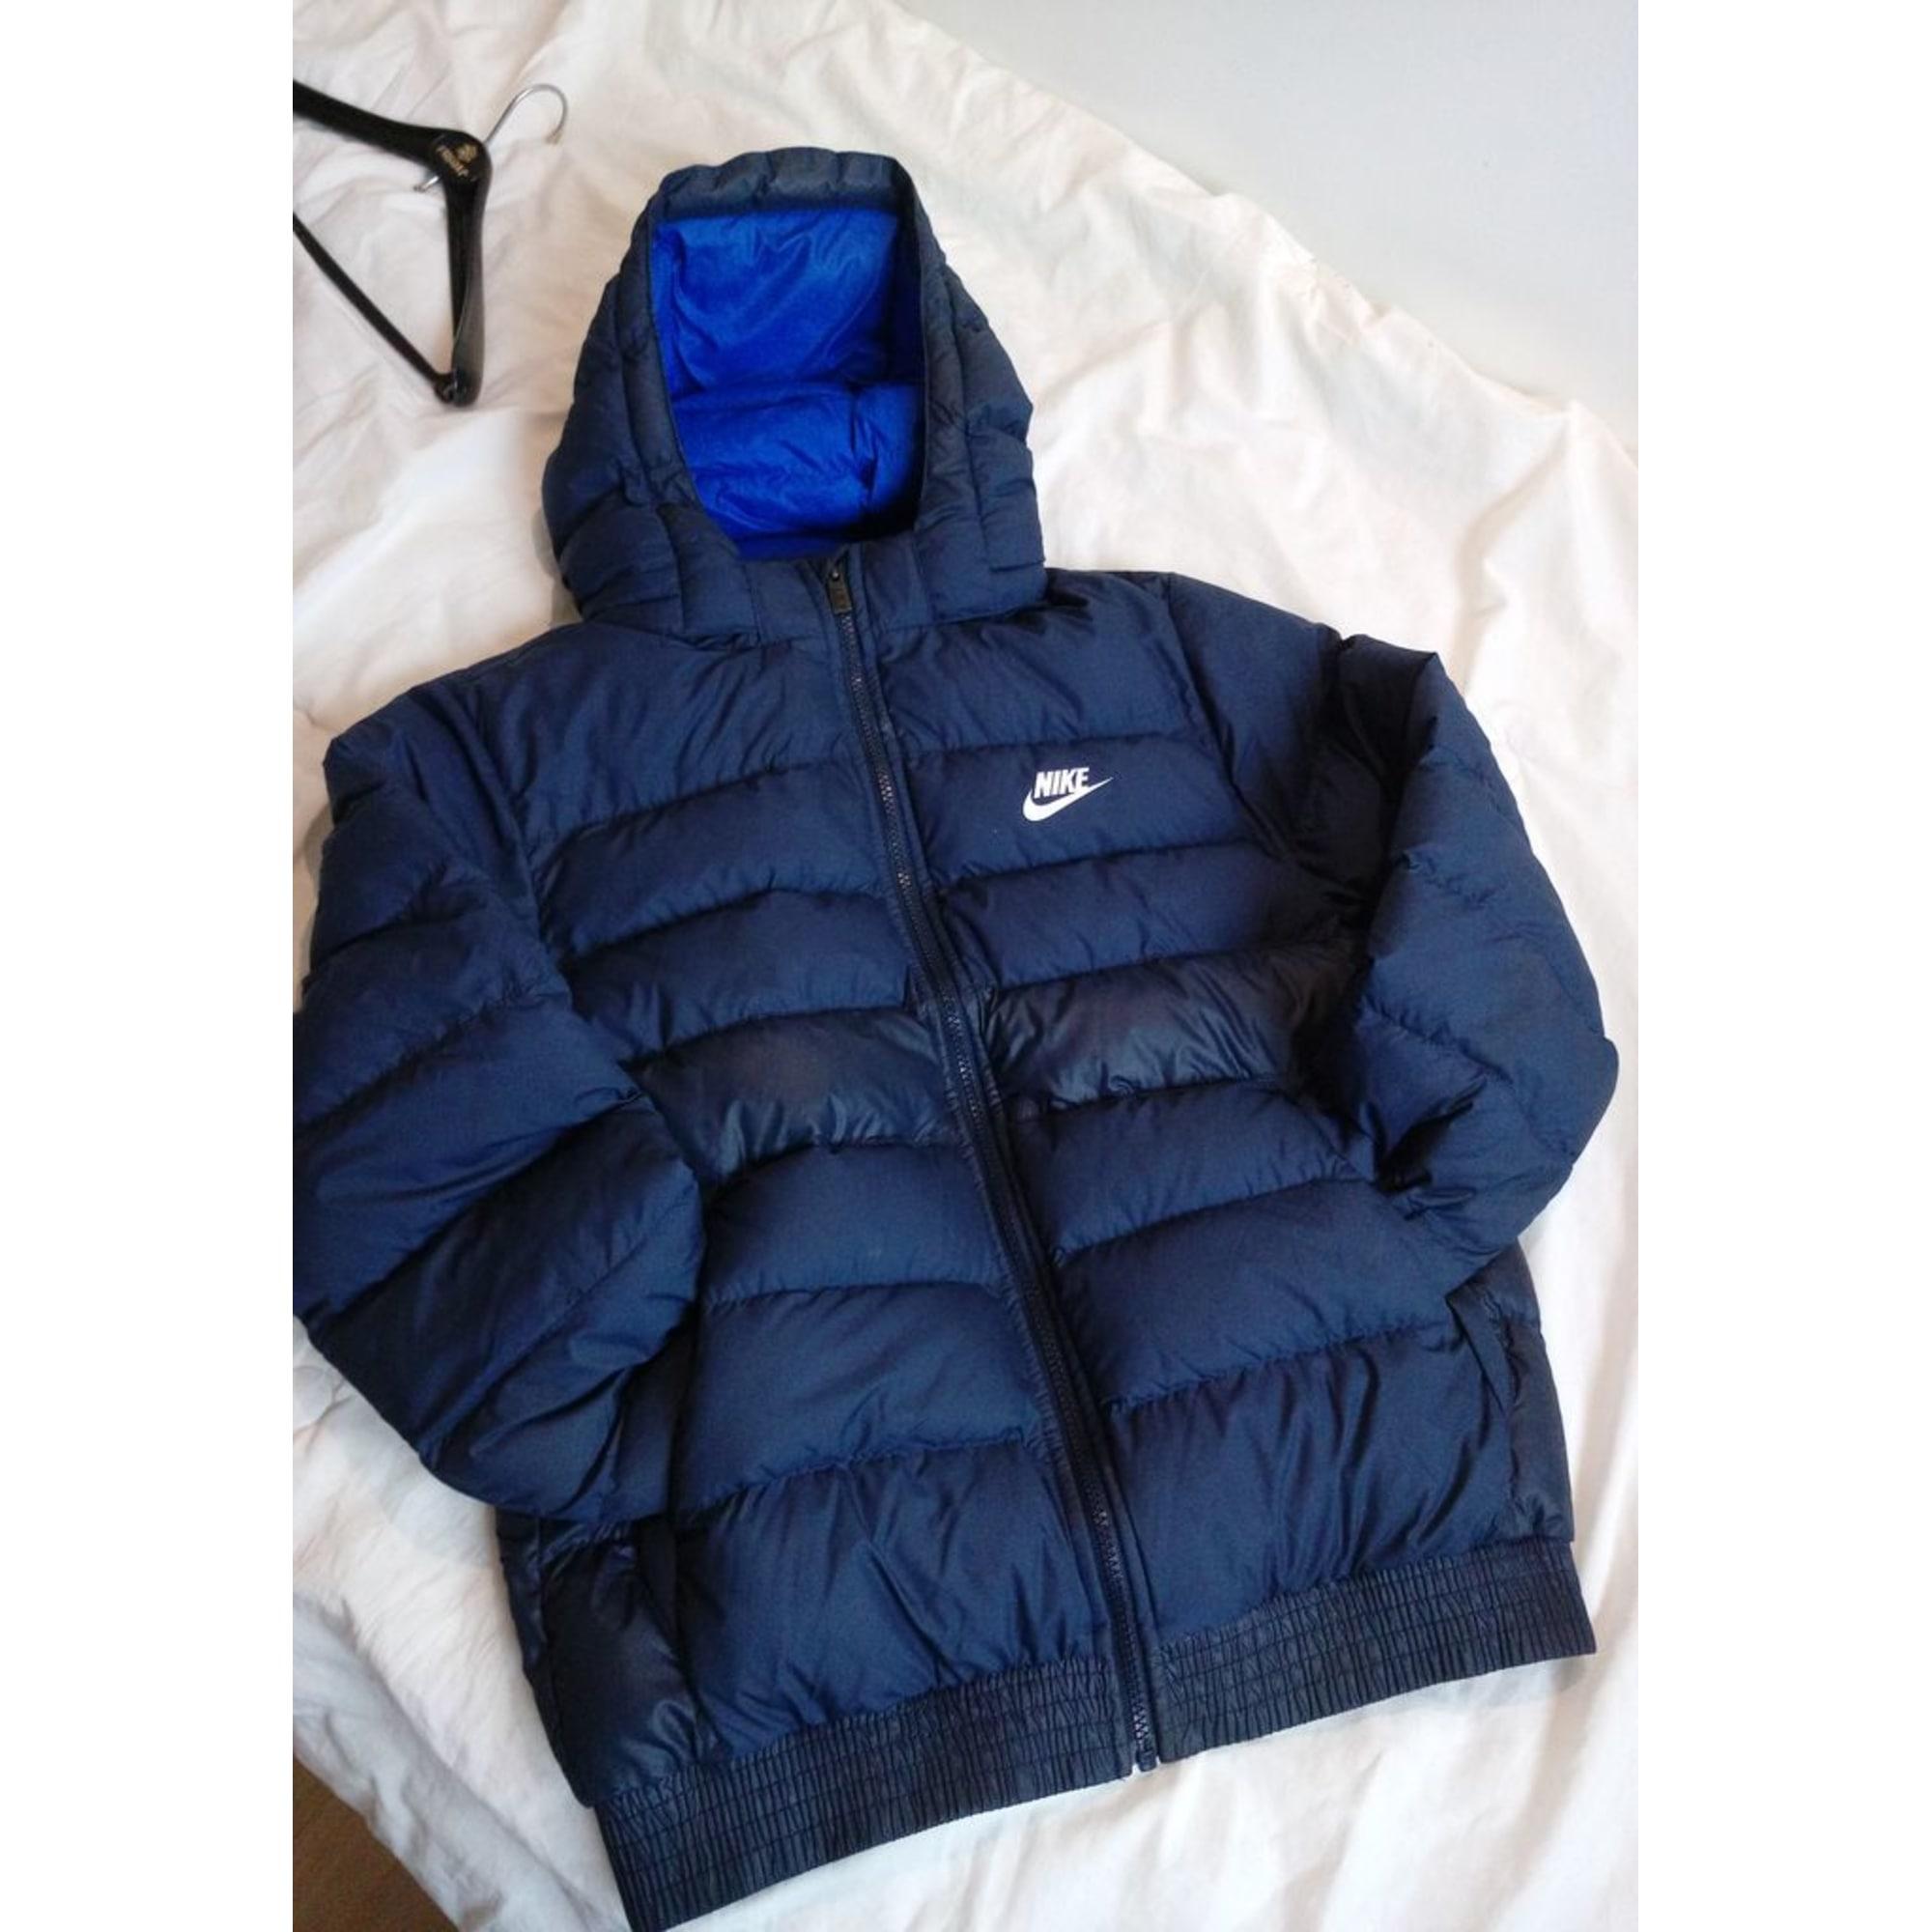 big sale af9de 3e684 Doudoune NIKE Bleu, bleu marine, bleu turquoise